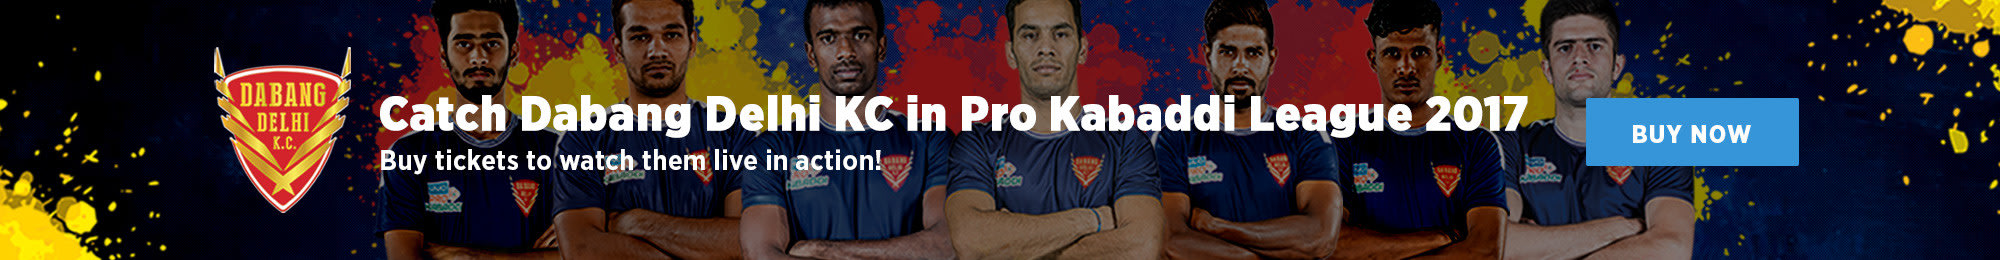 Catch Dabang Delhi KC in Pro Kabaddi League 2017!